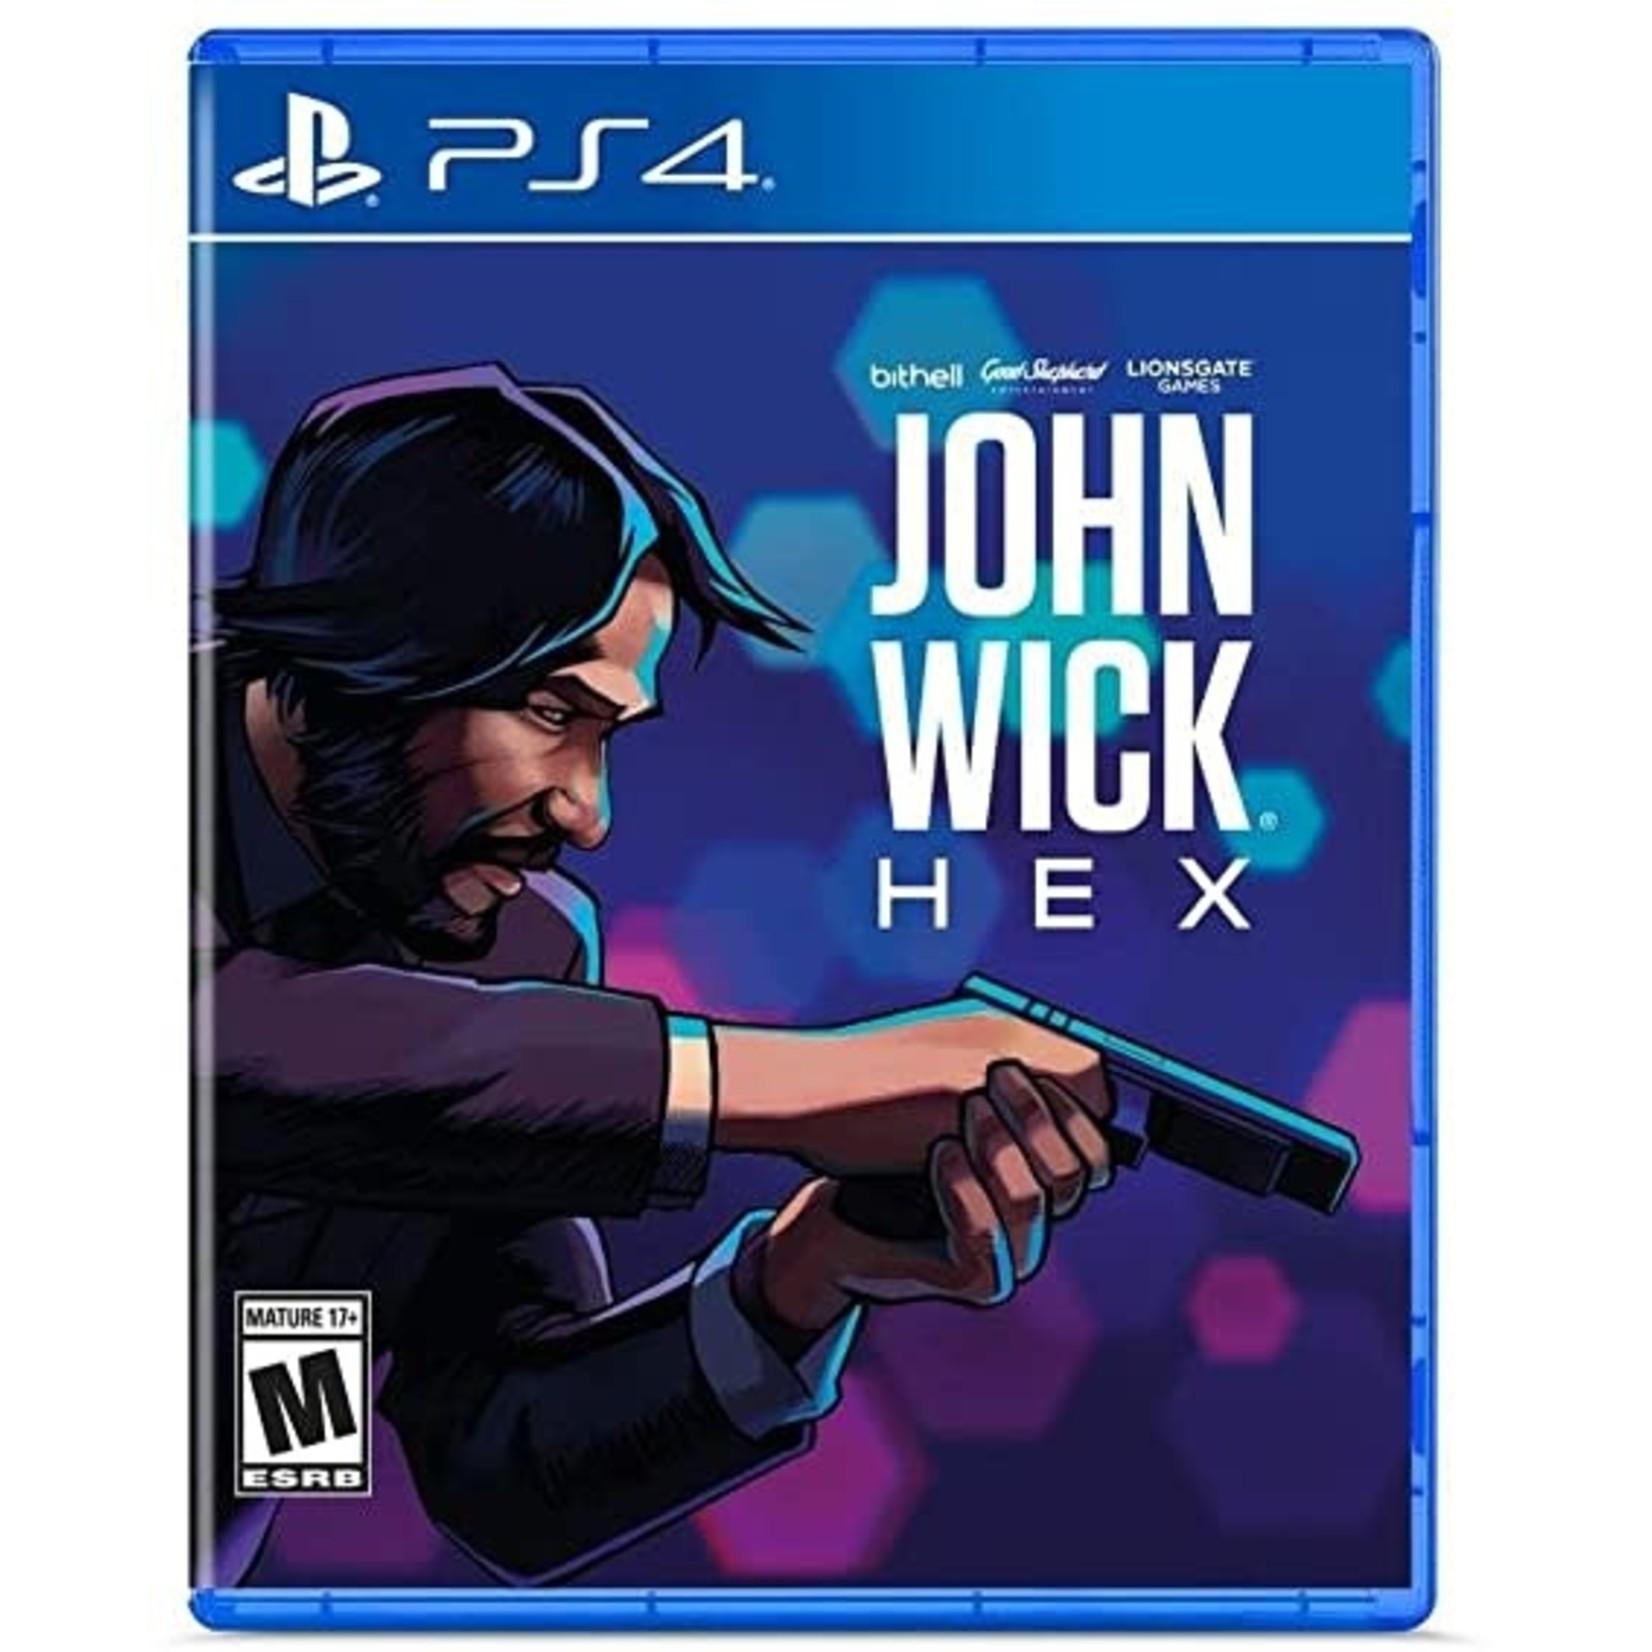 ps4u-John Wick Hex